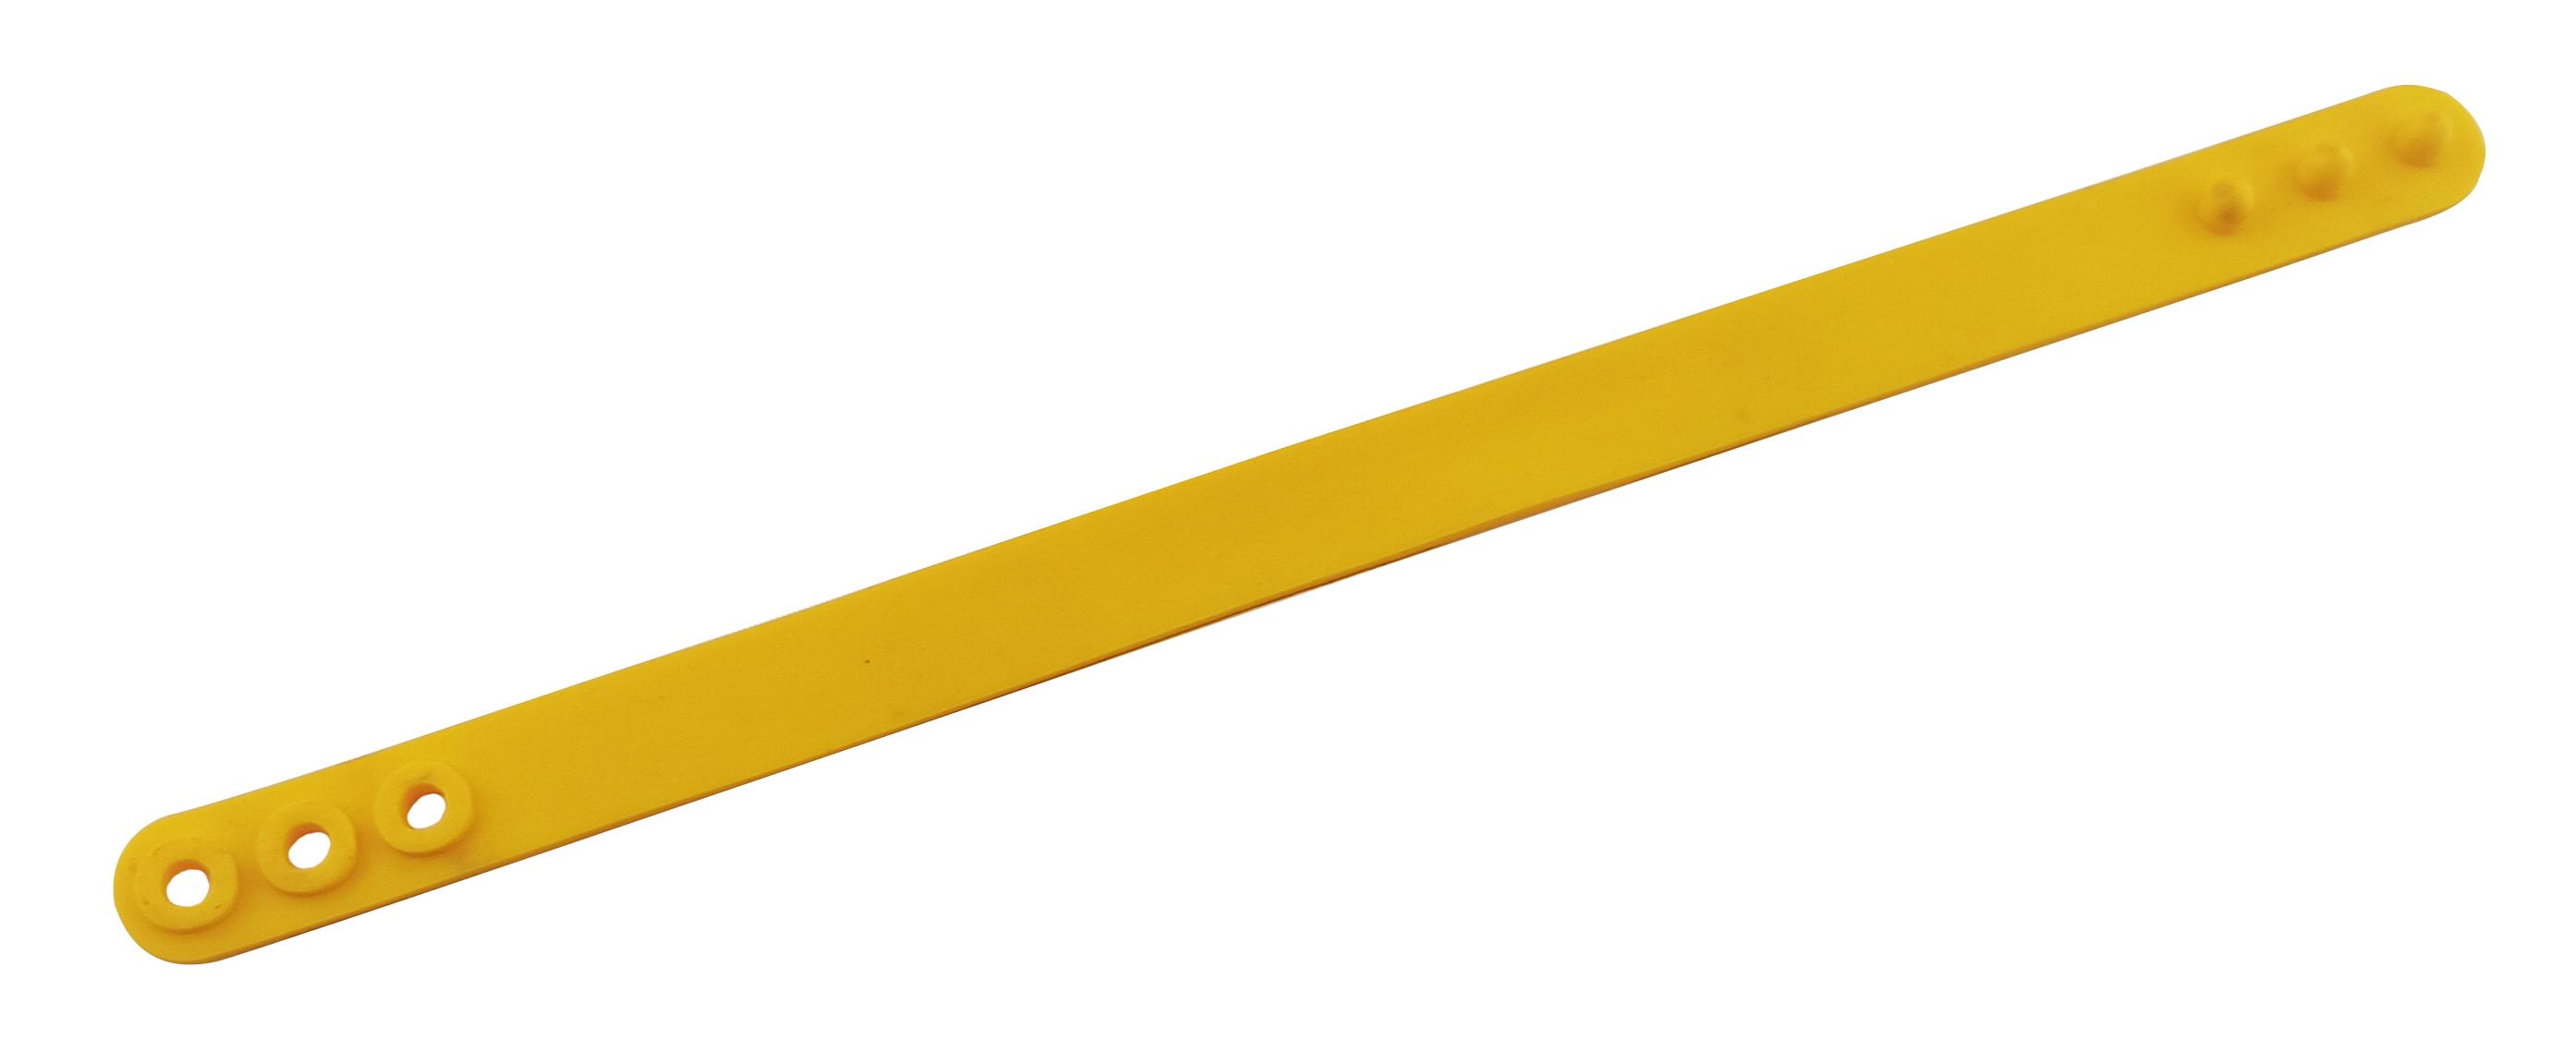 PB-01 SR PVC WRISTBAND